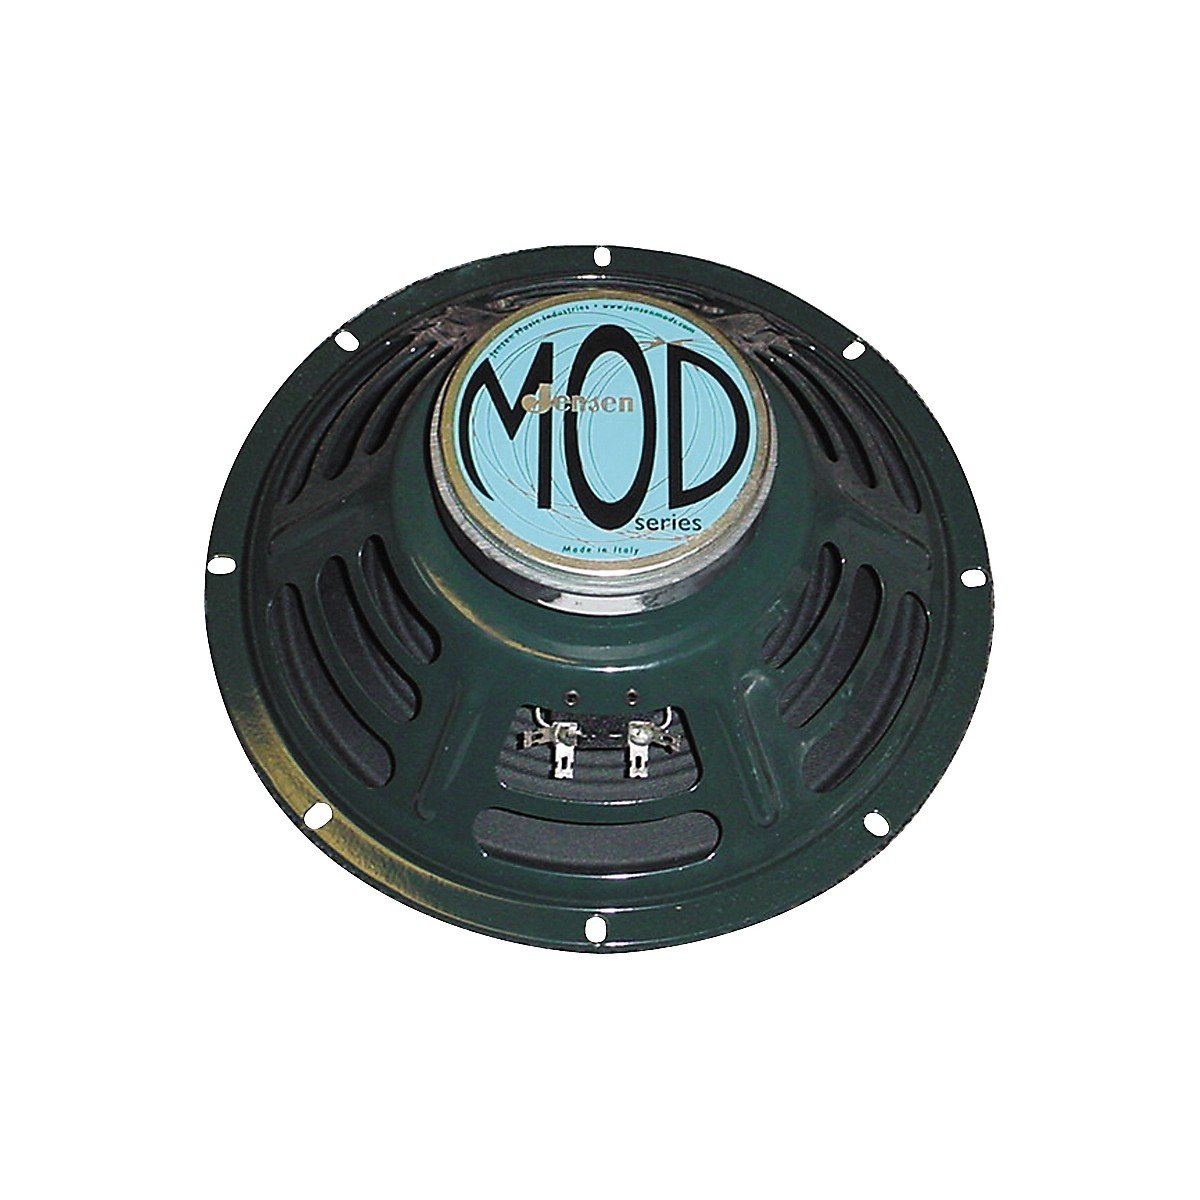 Jensen MOD12-50 50W 12'' Replacement Speaker 8 Ohm